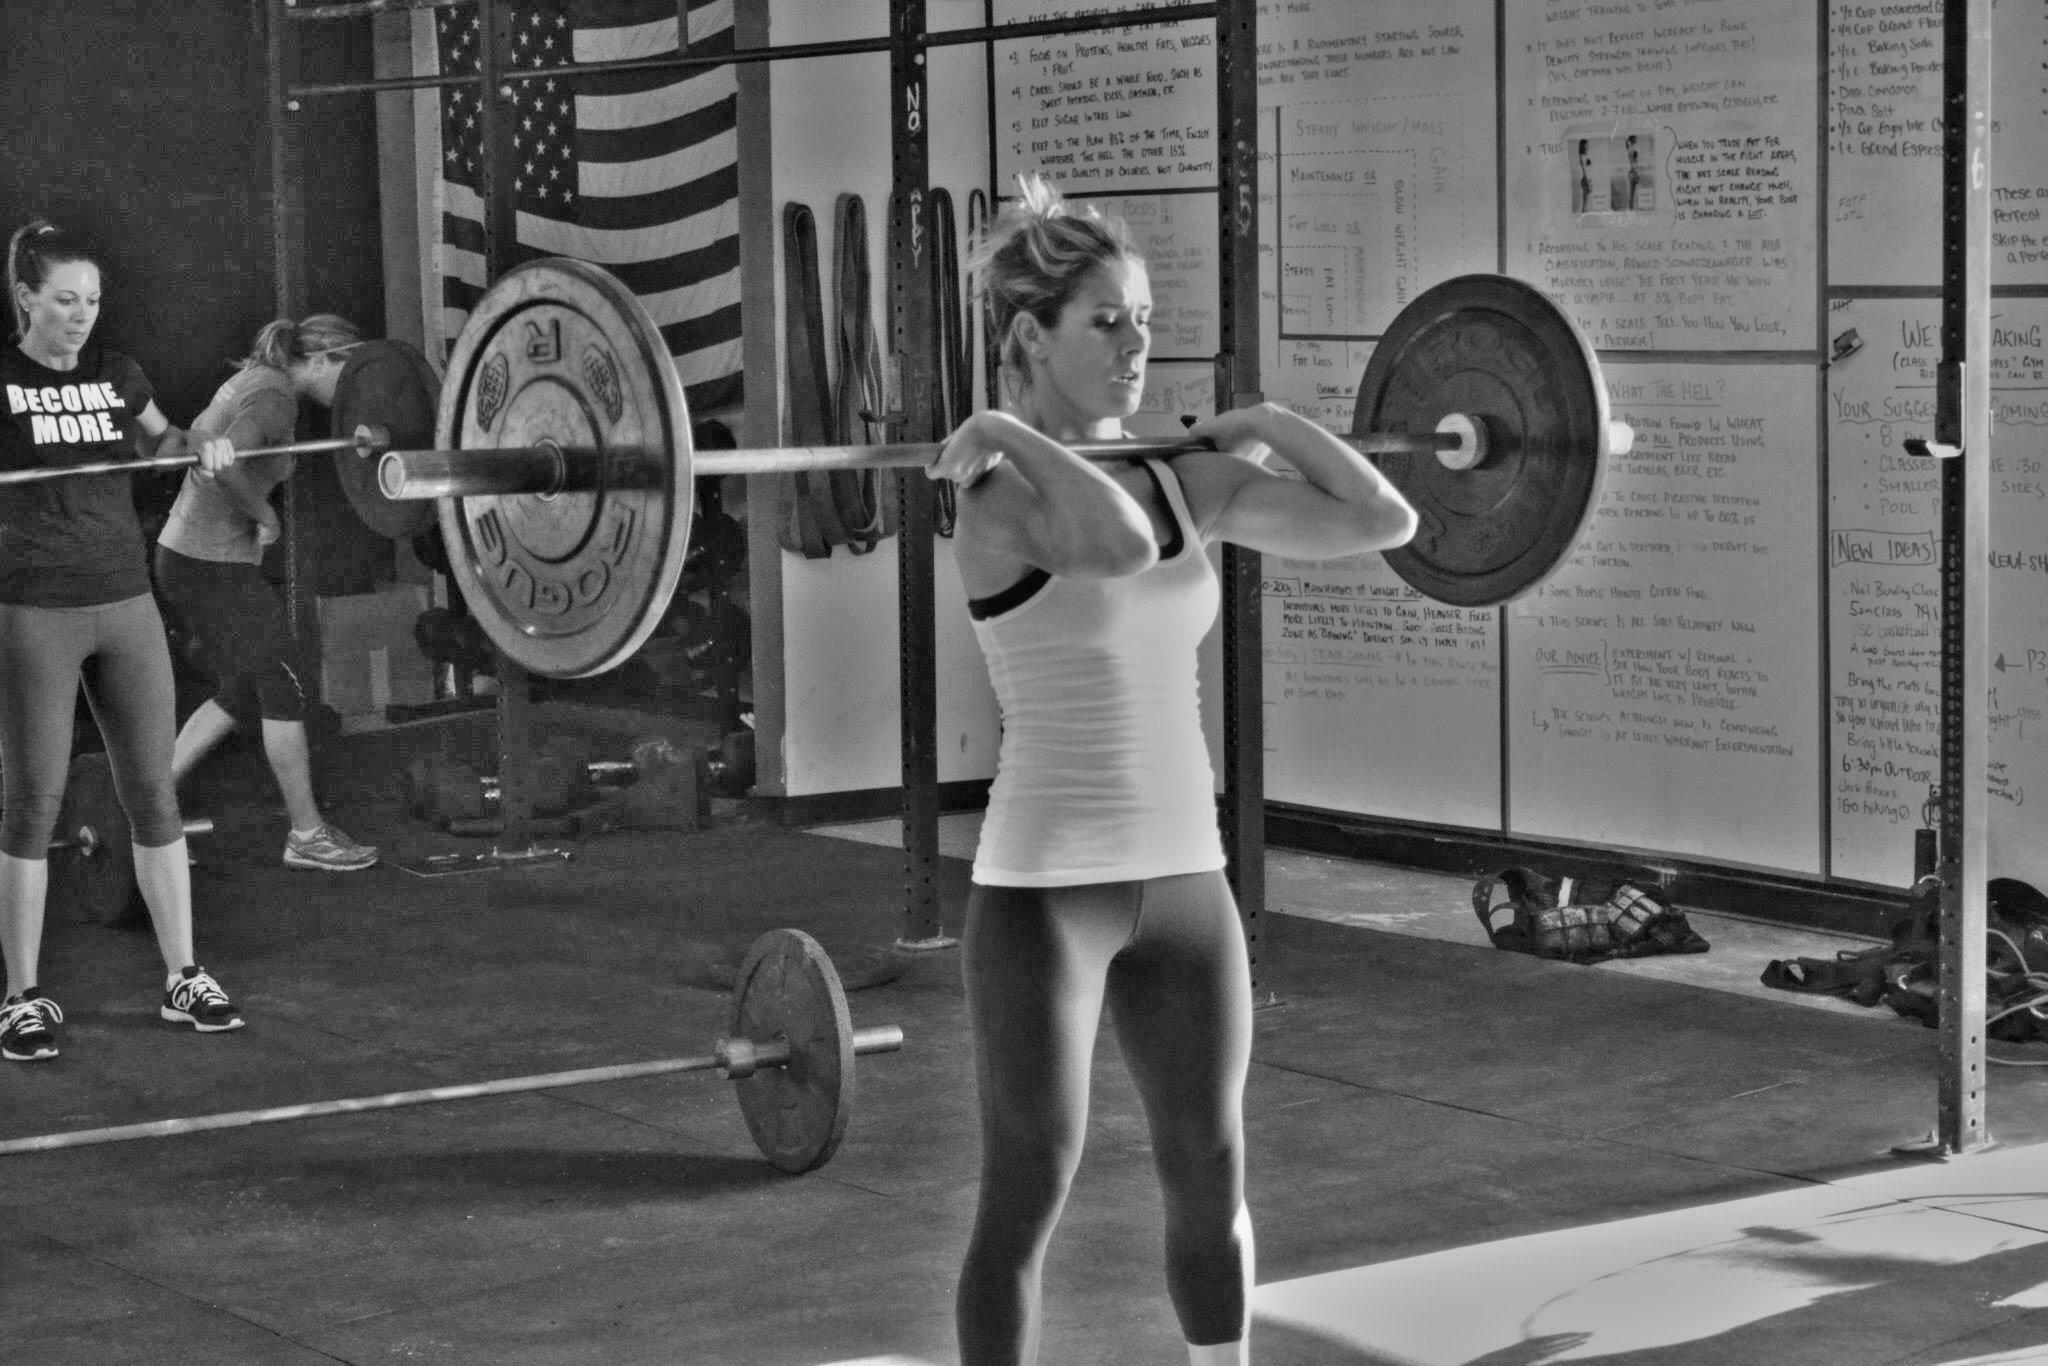 Will weights make women bulky?